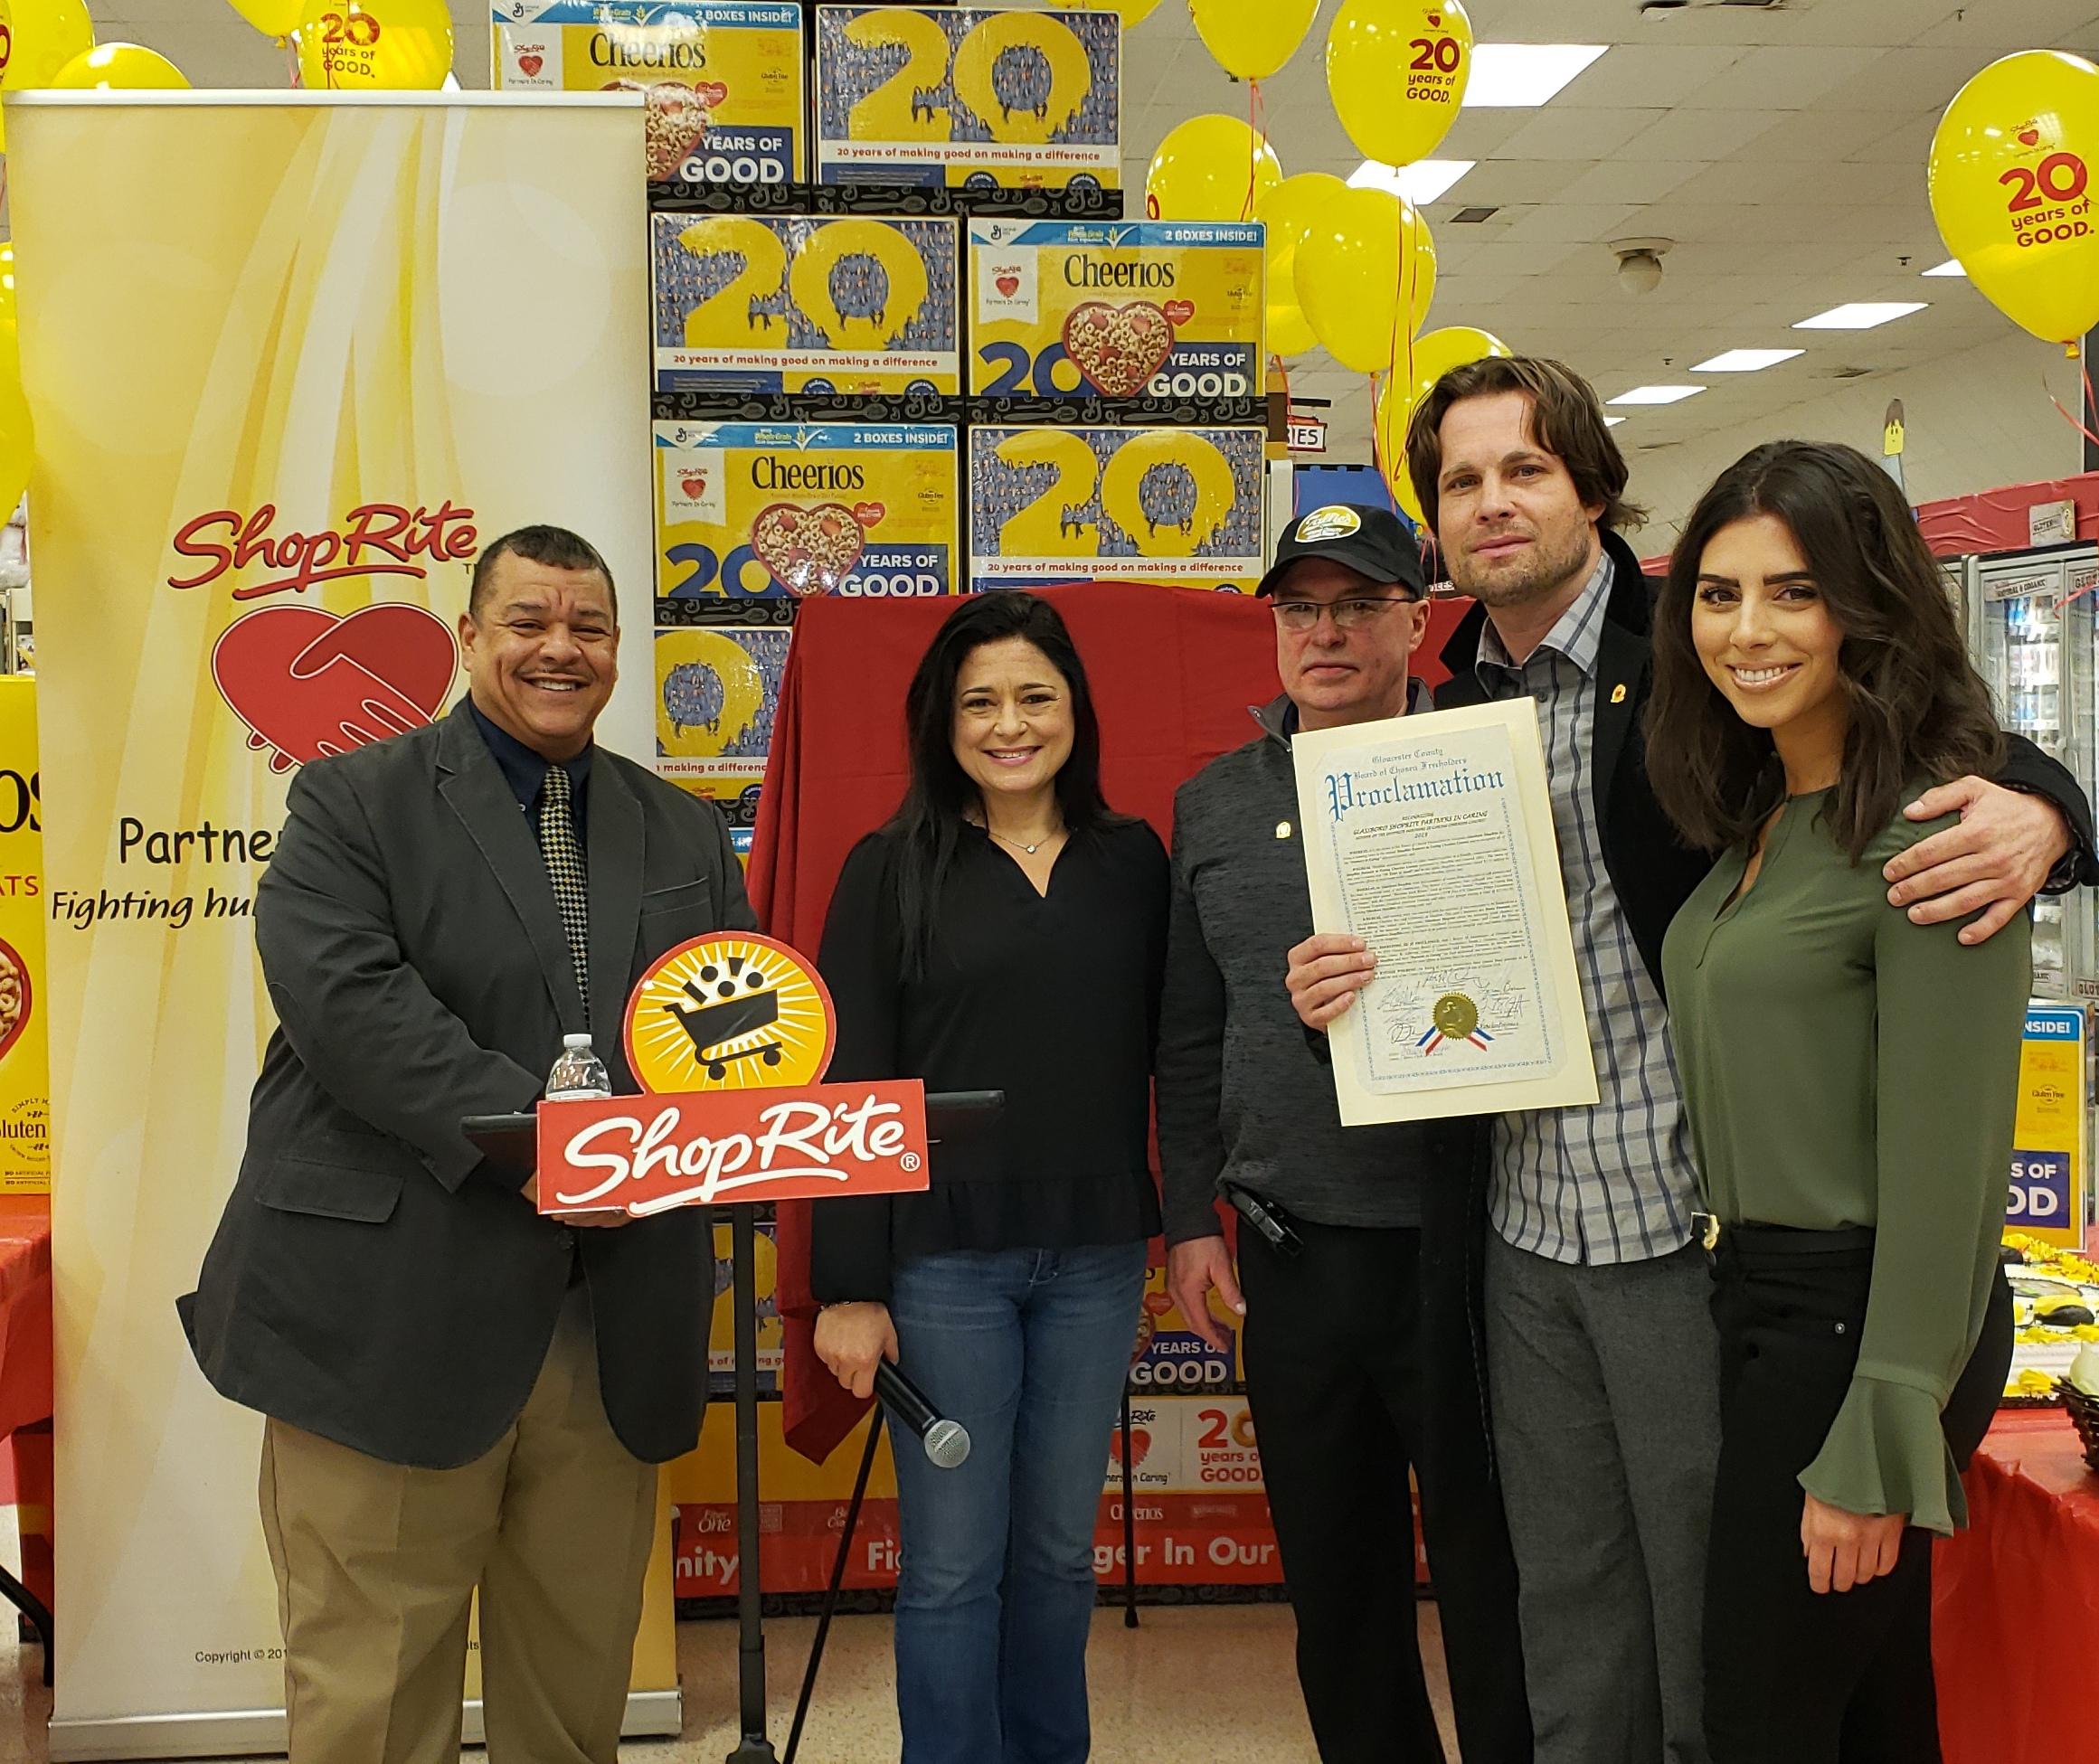 Mayor John E. Wallace III and Freeholder Heather Simmons award a proclamation